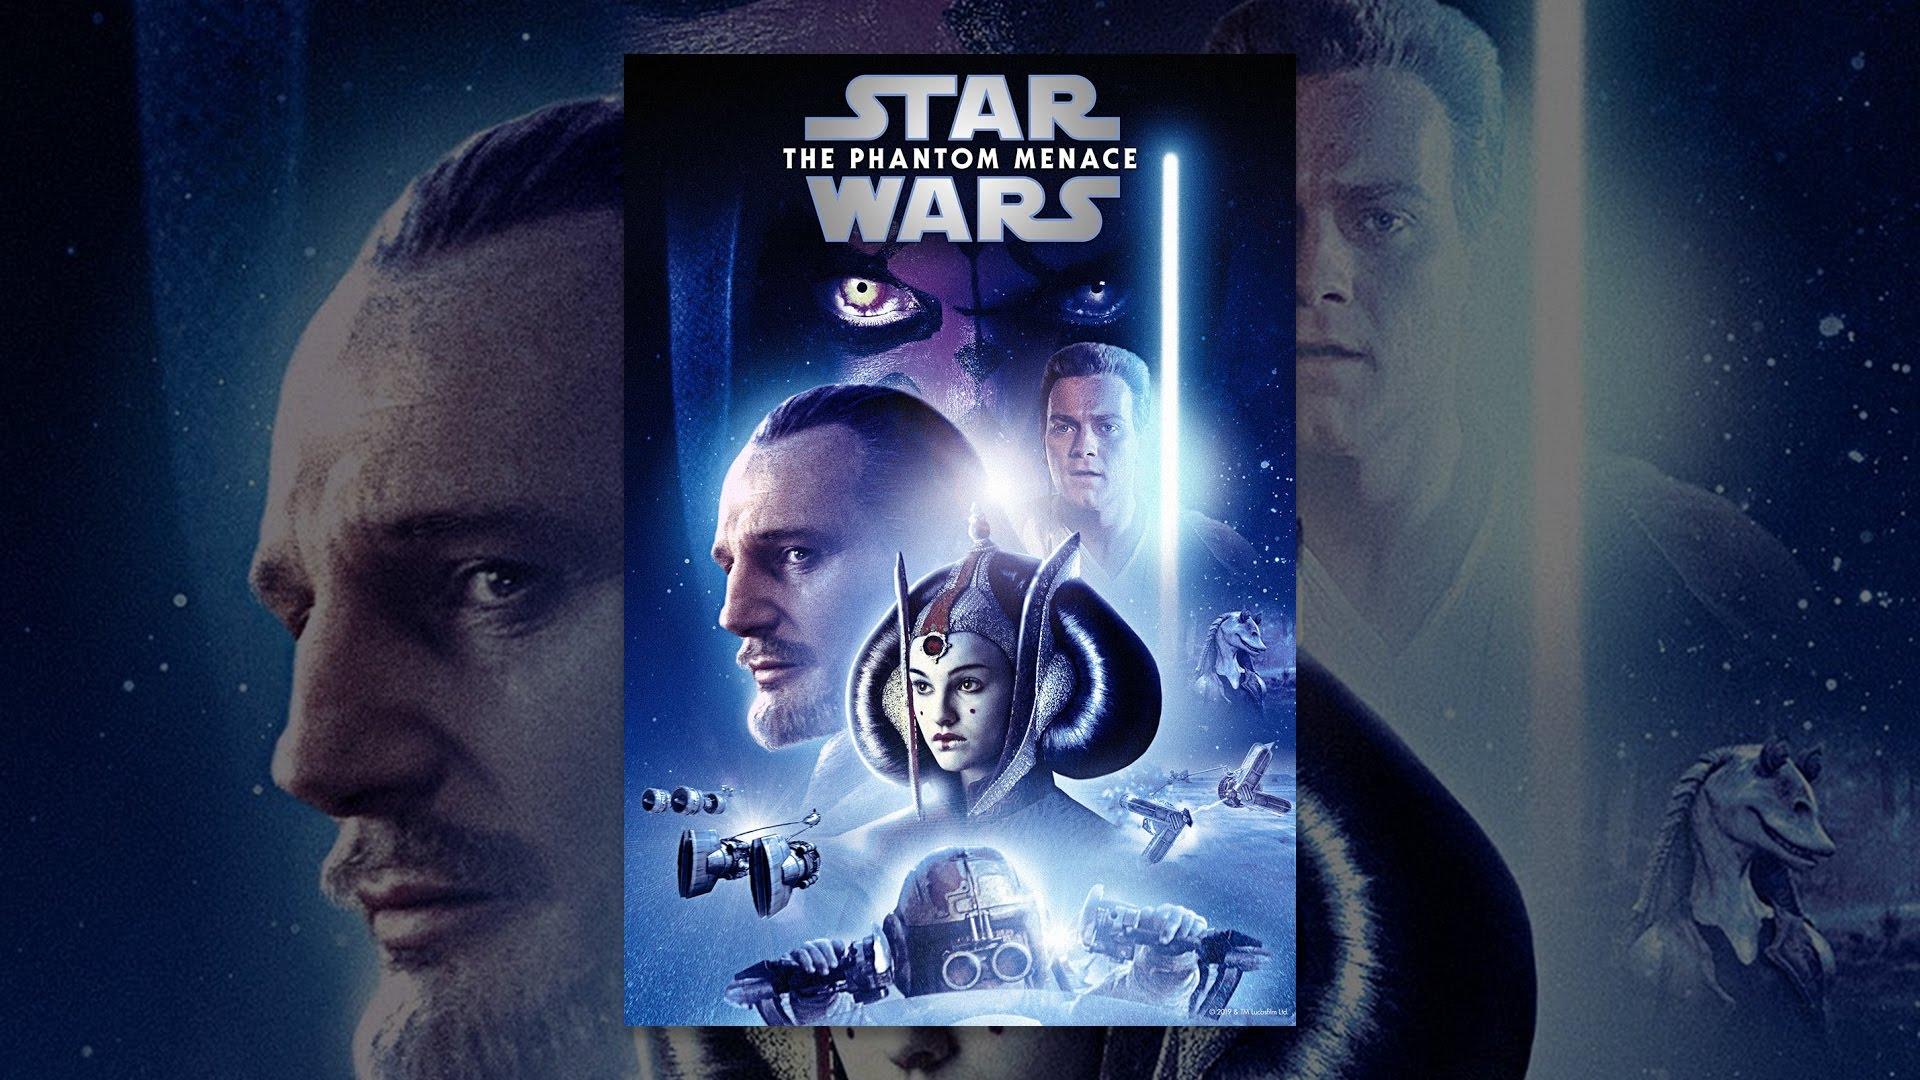 Star Wars: Episode I: The Phantom Menace - Modern Trailer ... |Star Wars Phantom Menace Youtube